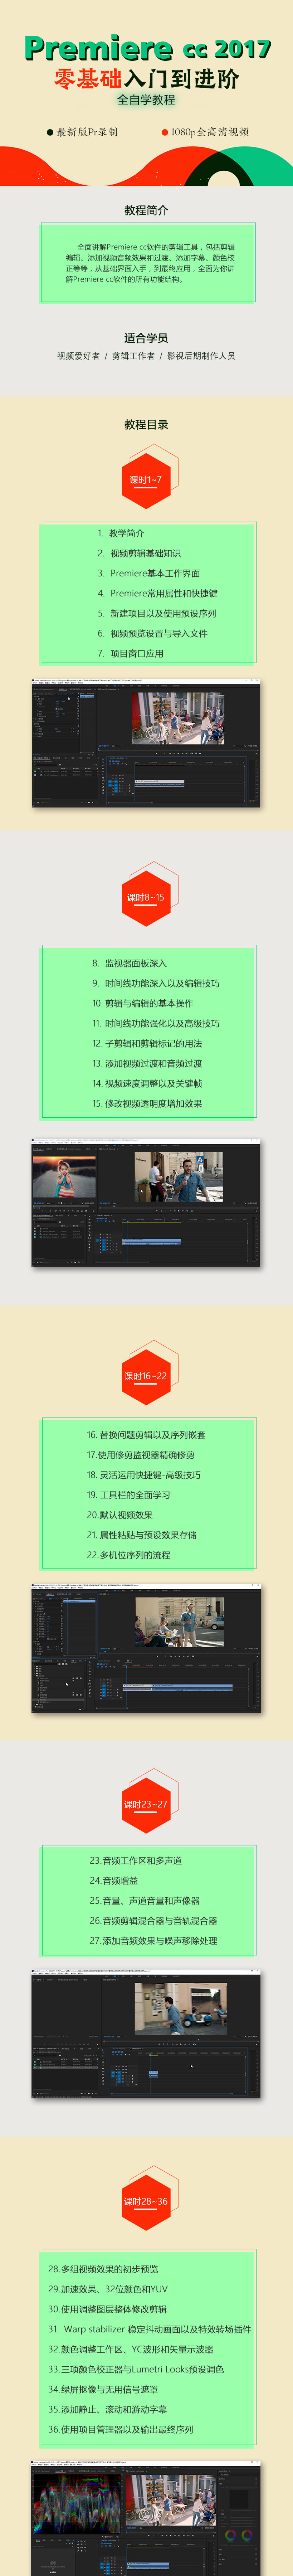 Premiere CC 2017 零基础入门到进阶全功能教程.jpg